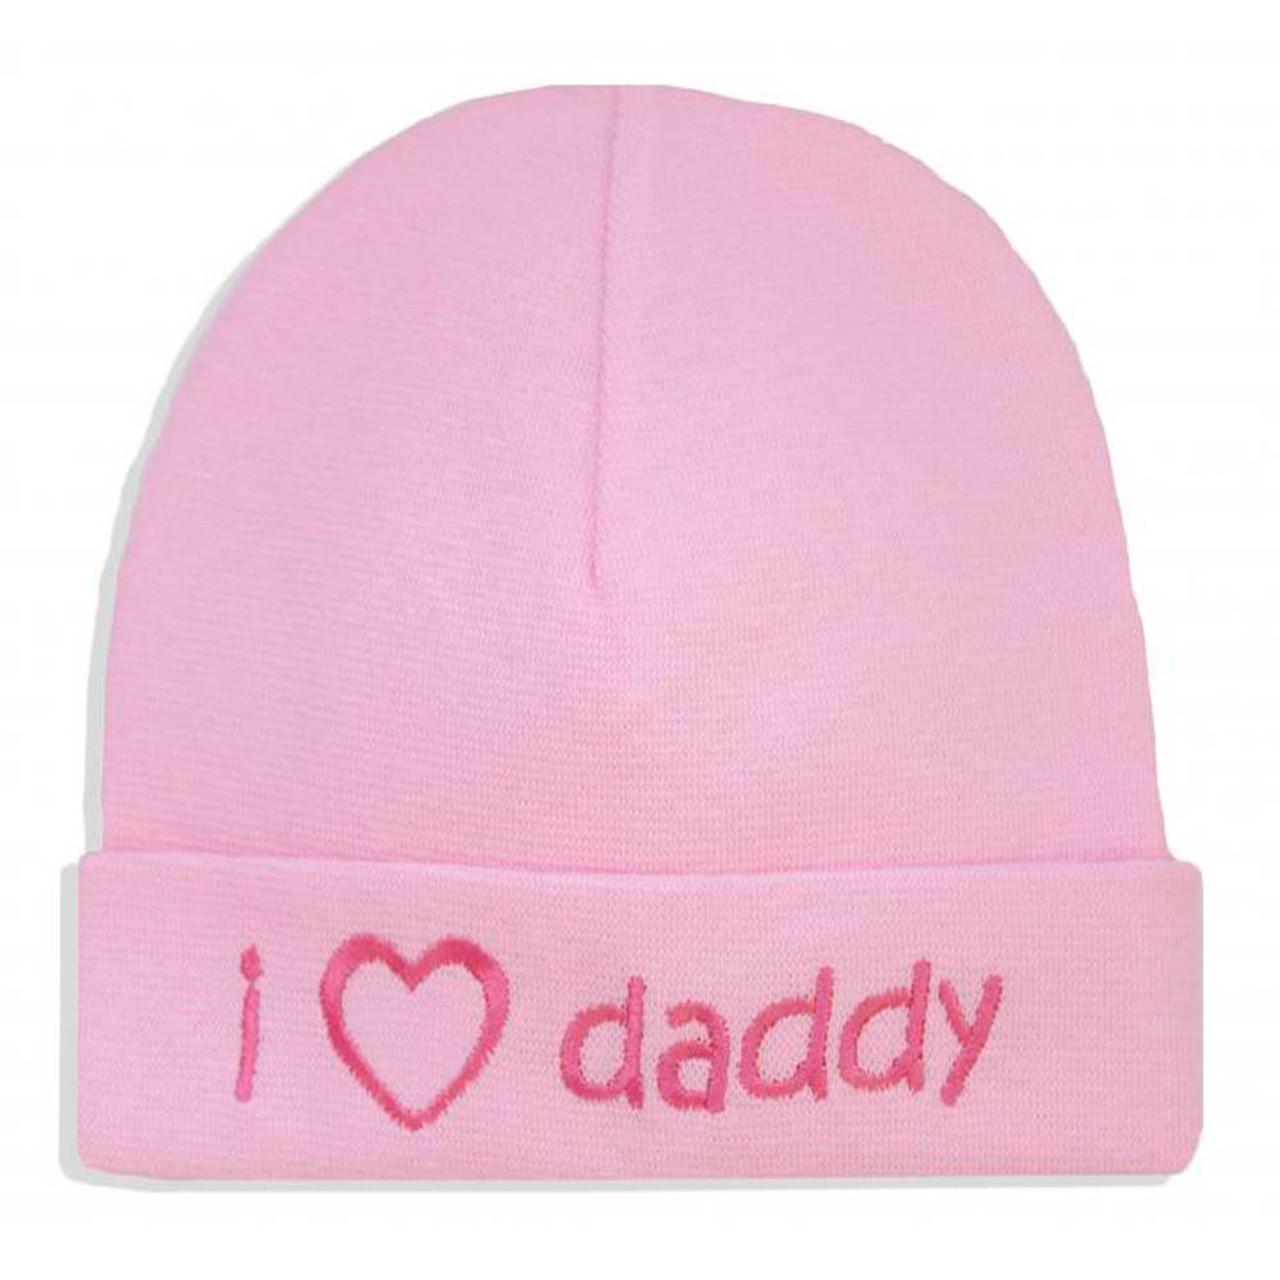 6bb04b48fc3b Itty Bitty Baby Embroidered Toque - I Love Daddy Pink (PR) - Dear ...